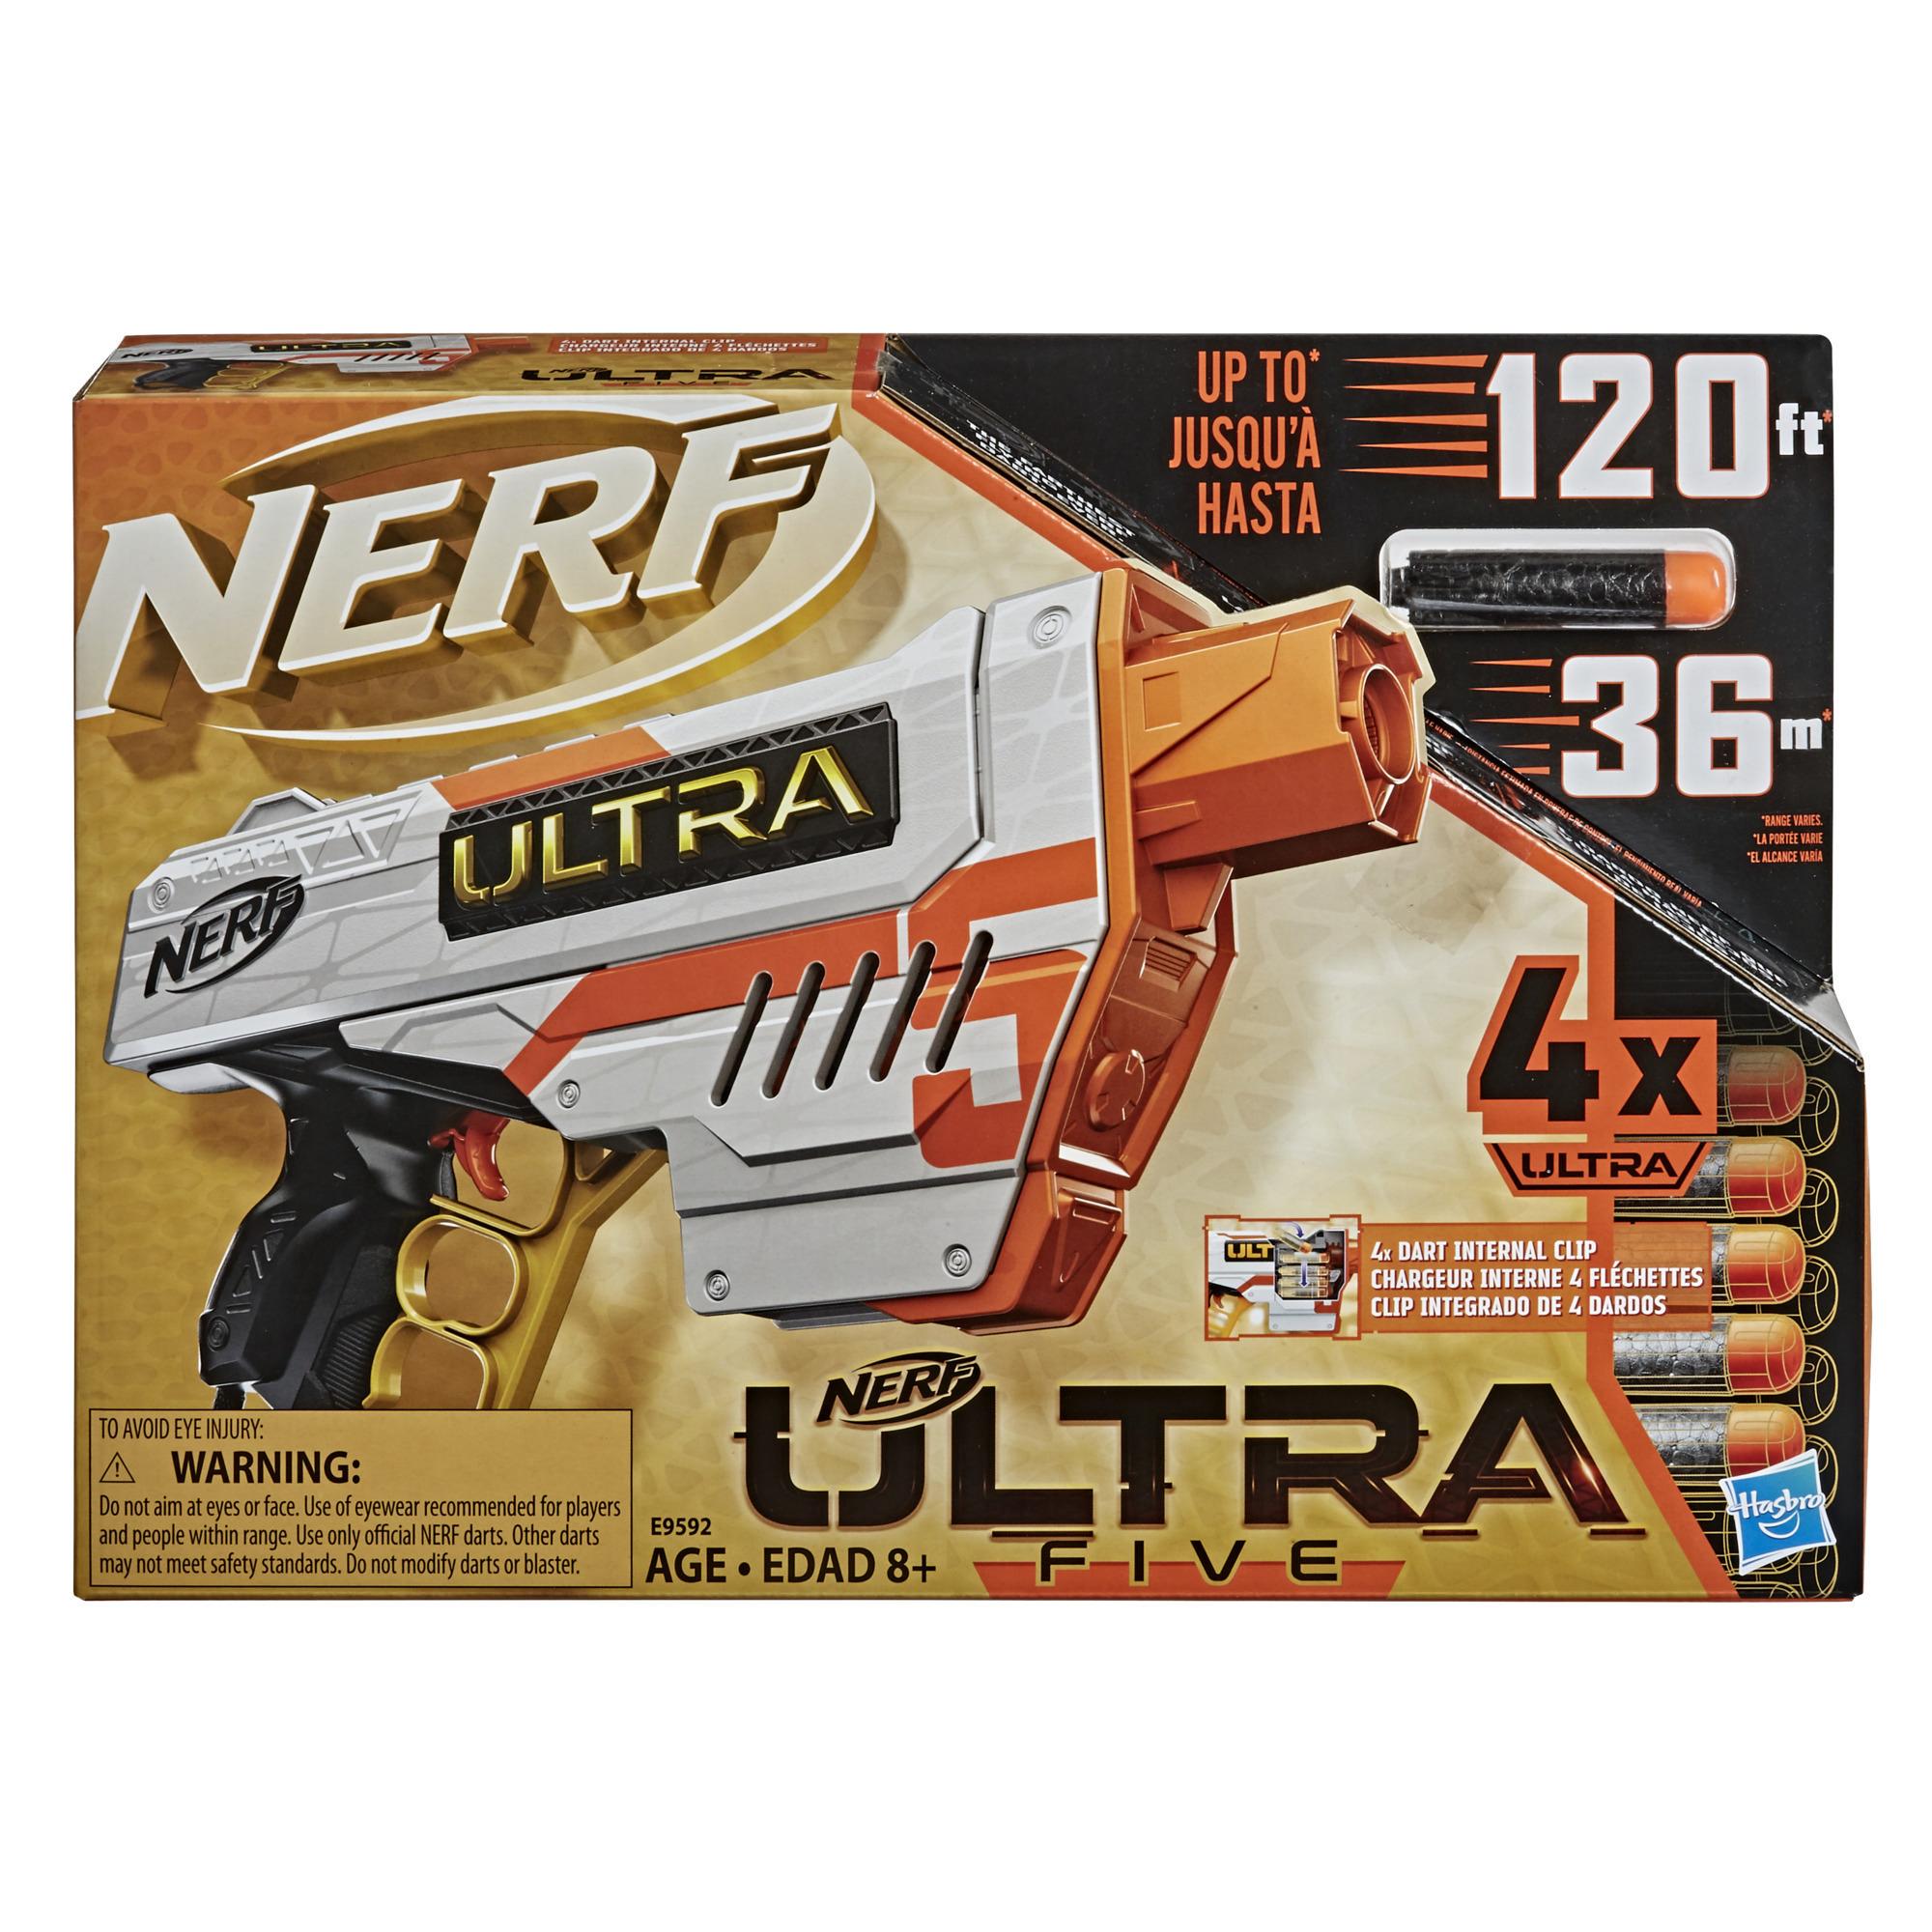 Nerf Ultra - Blaster Five, chargeur intégré 4 fléchettes, 4 fléchettes Nerf Ultra, rangement pour fléchettes, compatible uniquement avec les fléchettes Nerf Ultra